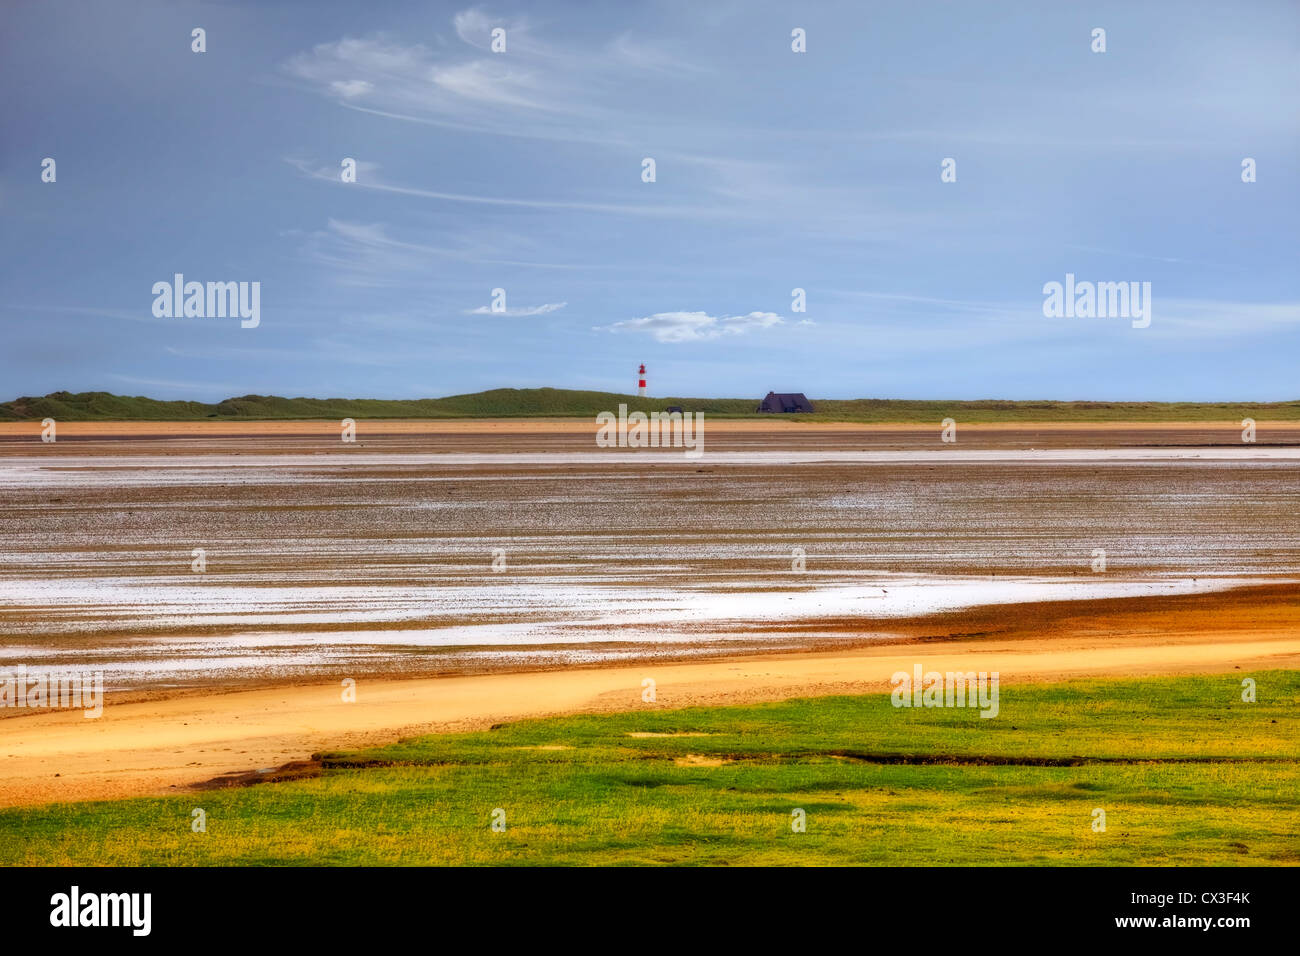 Koenig harbor, elbow, Wadden Sea, Sylt, Schleswig-Holstein, Germany - Stock Image